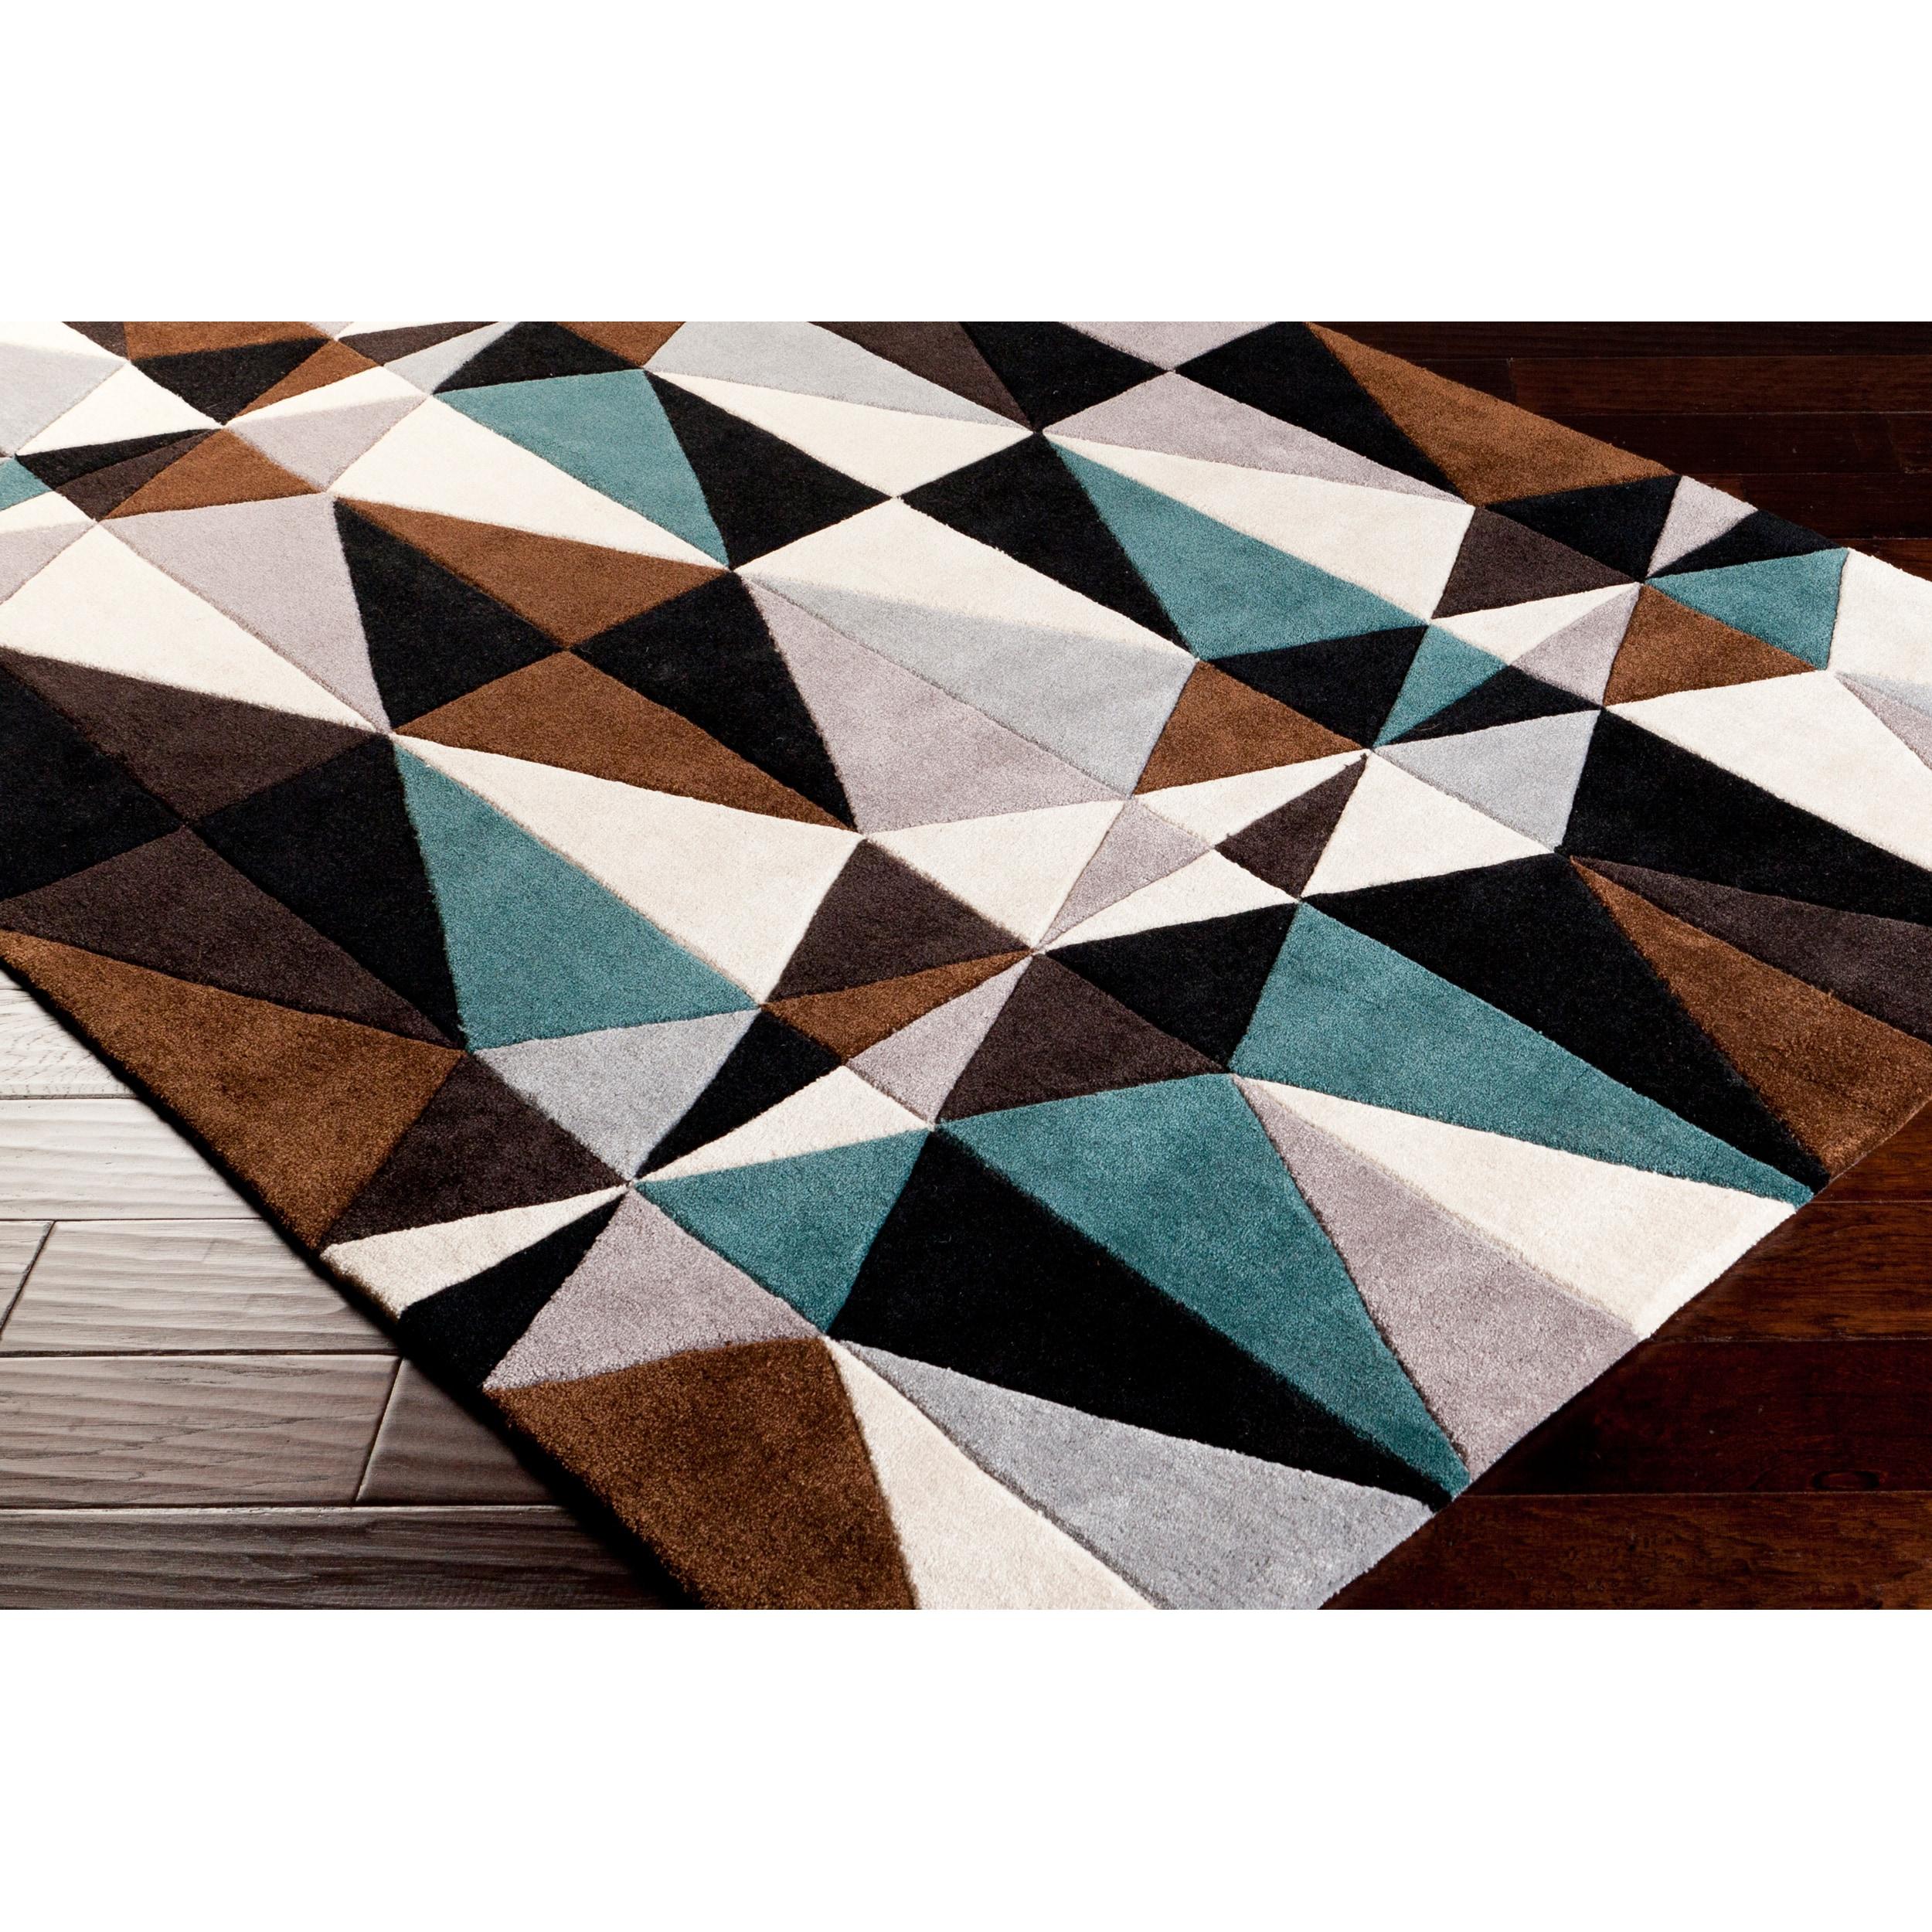 Hand-tufted Kaleidoscope Teal Contemporary Geometric Rug